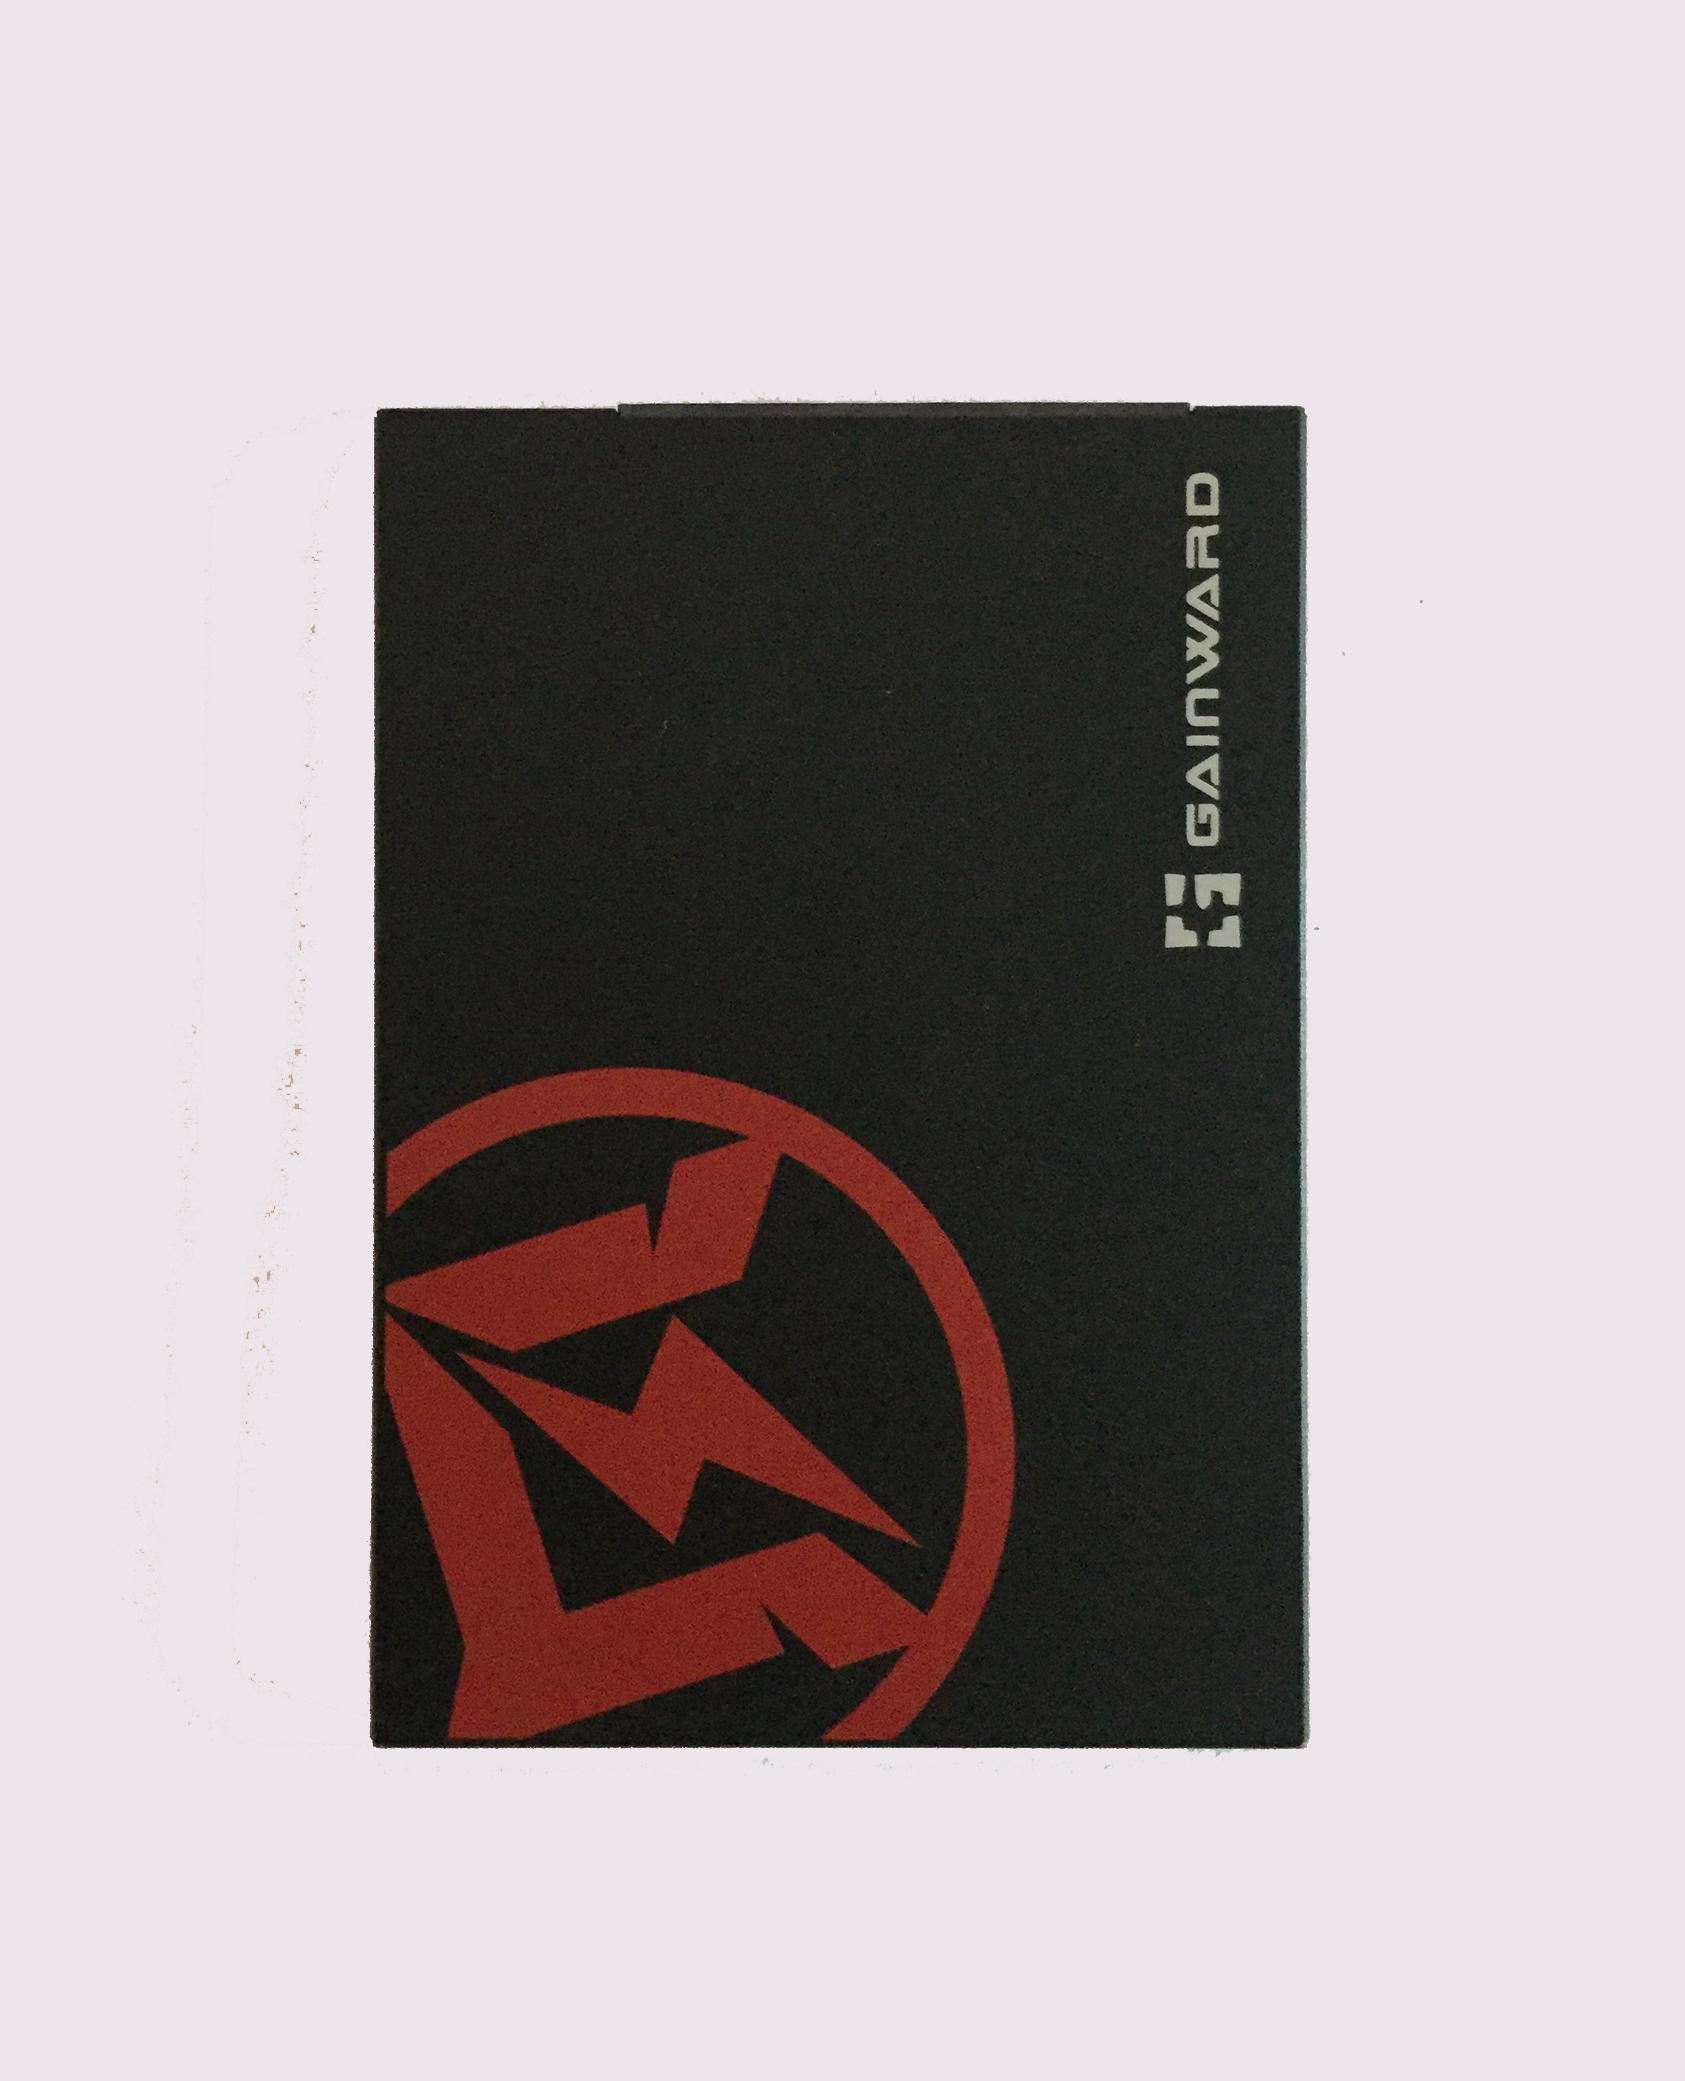 SSD Mới - GainWard 240GB | Laptop Danh Phong